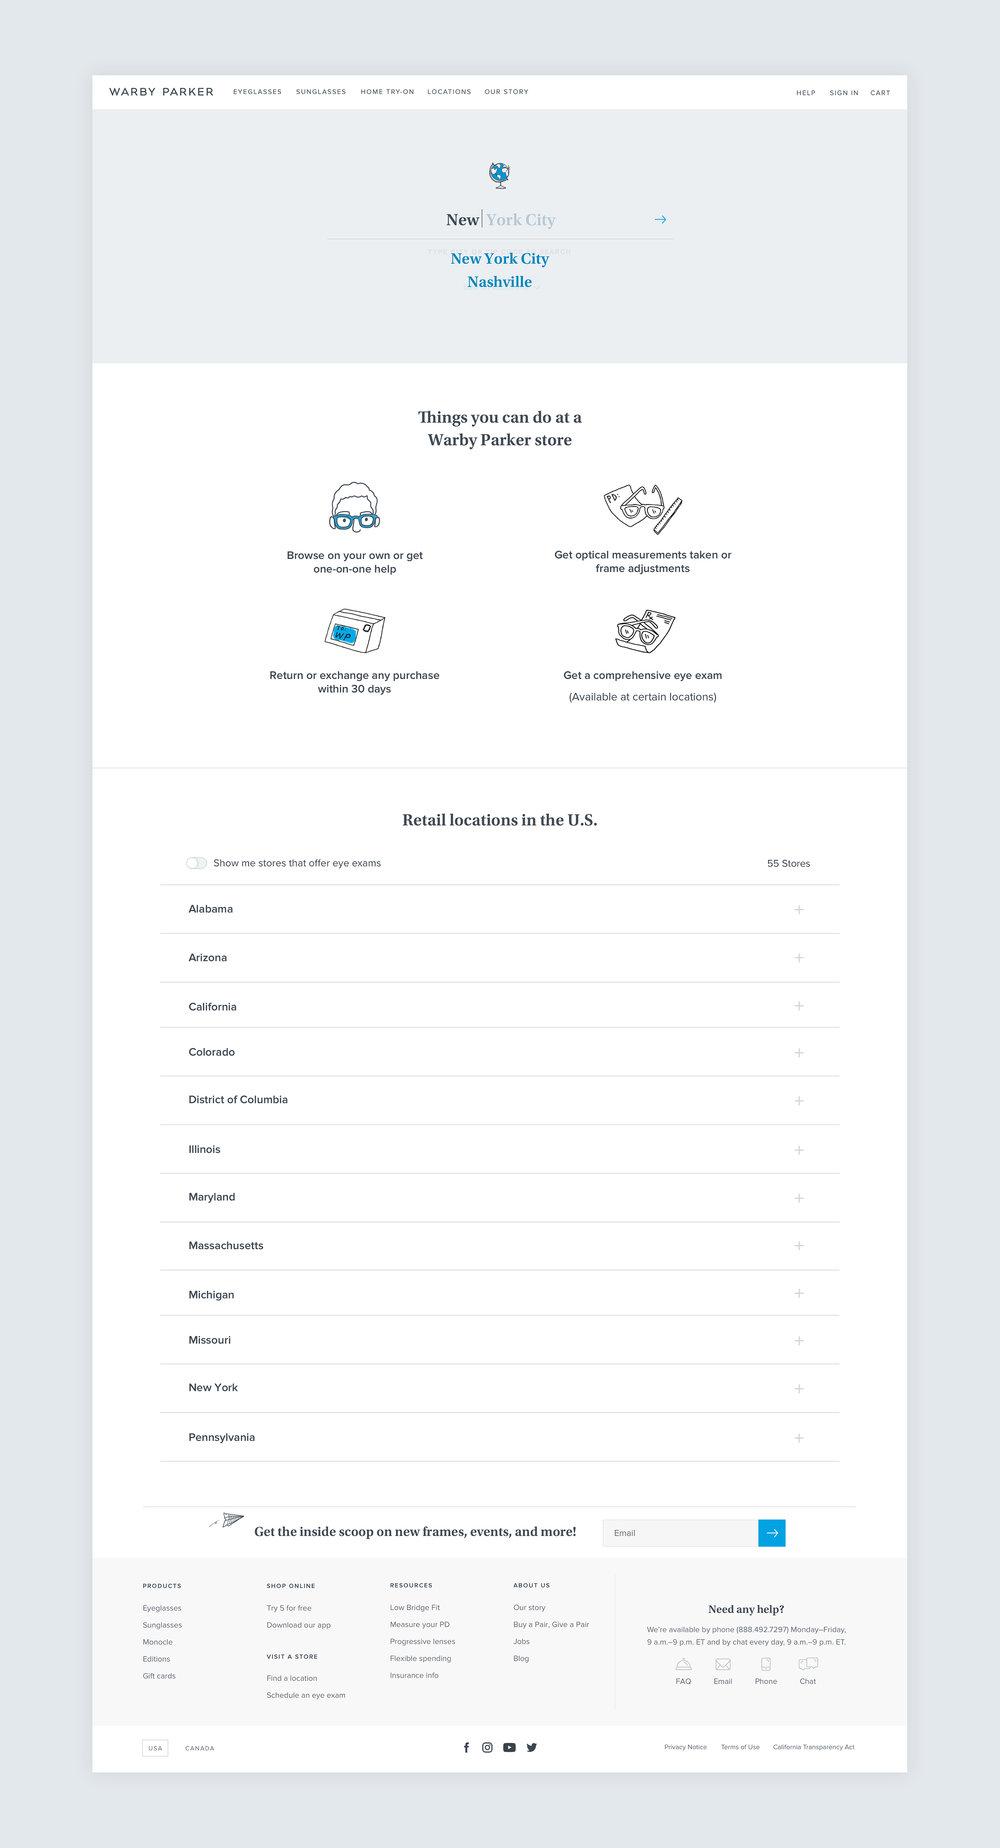 WarbyParker_Retail_Desktop_03.jpg